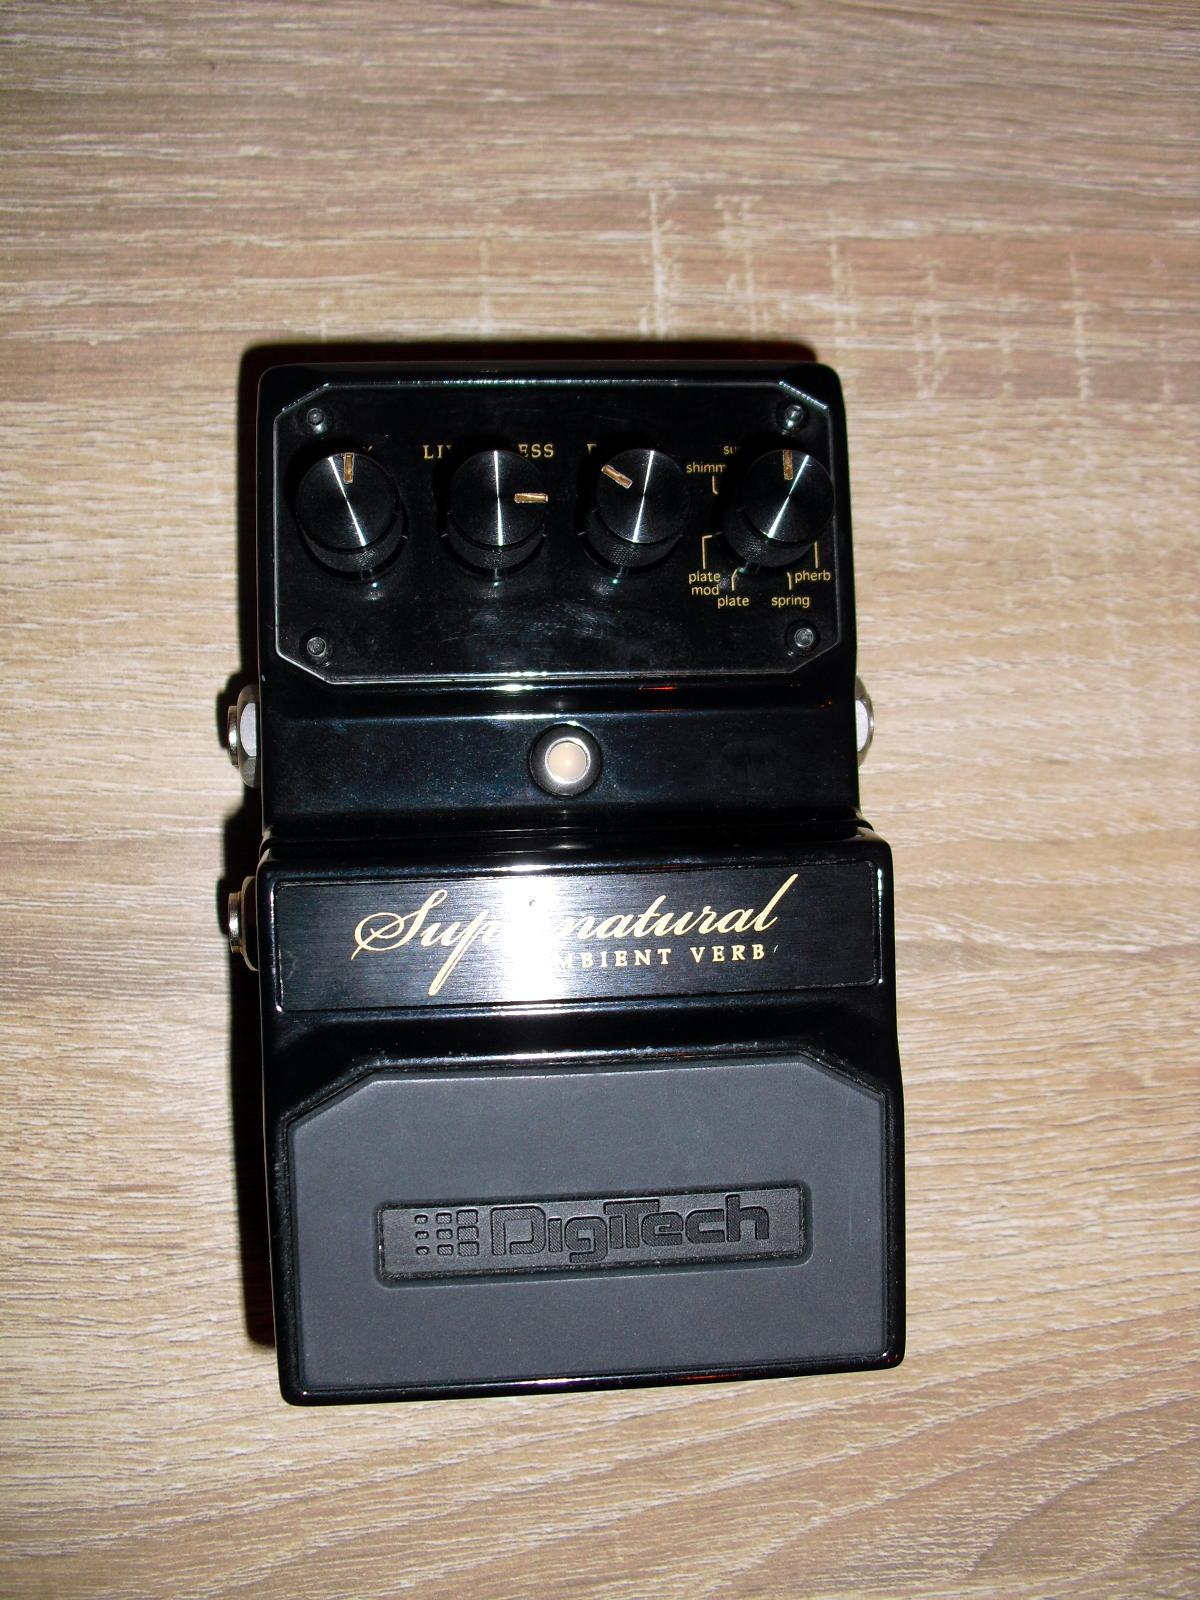 hardwire pedals supernatural ambient verb image 1727845 audiofanzine. Black Bedroom Furniture Sets. Home Design Ideas